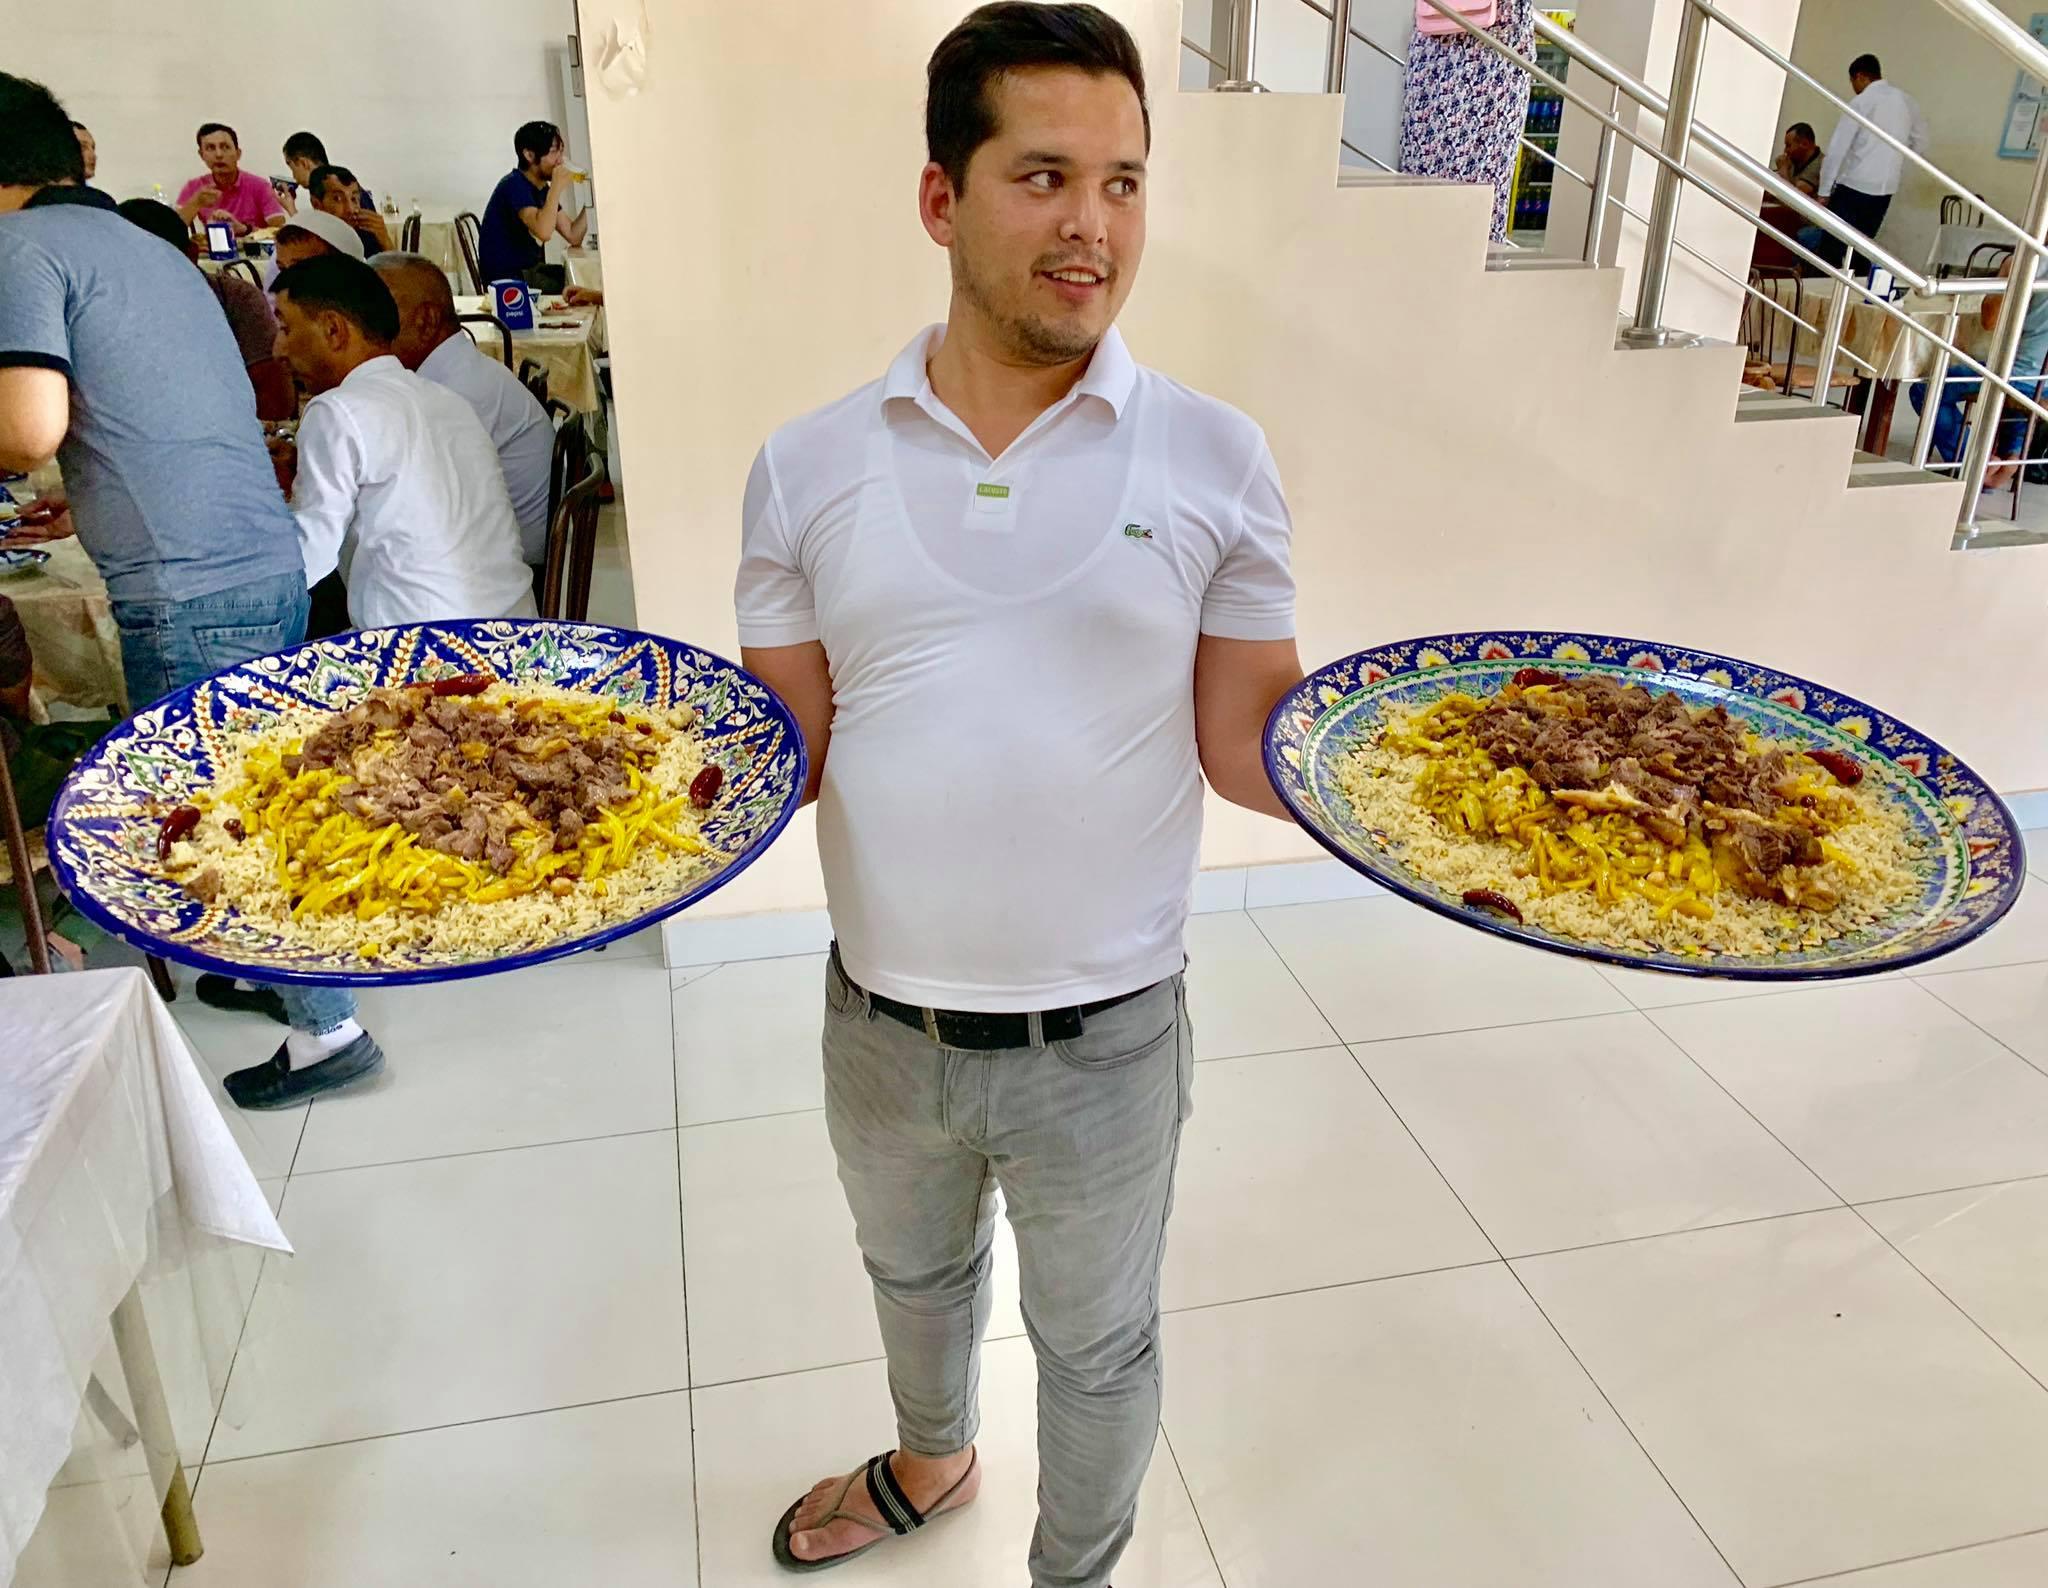 Kach Solo Travels in 2019 Siyab Bazaar and Registan on my first day in Samarkand33.jpg